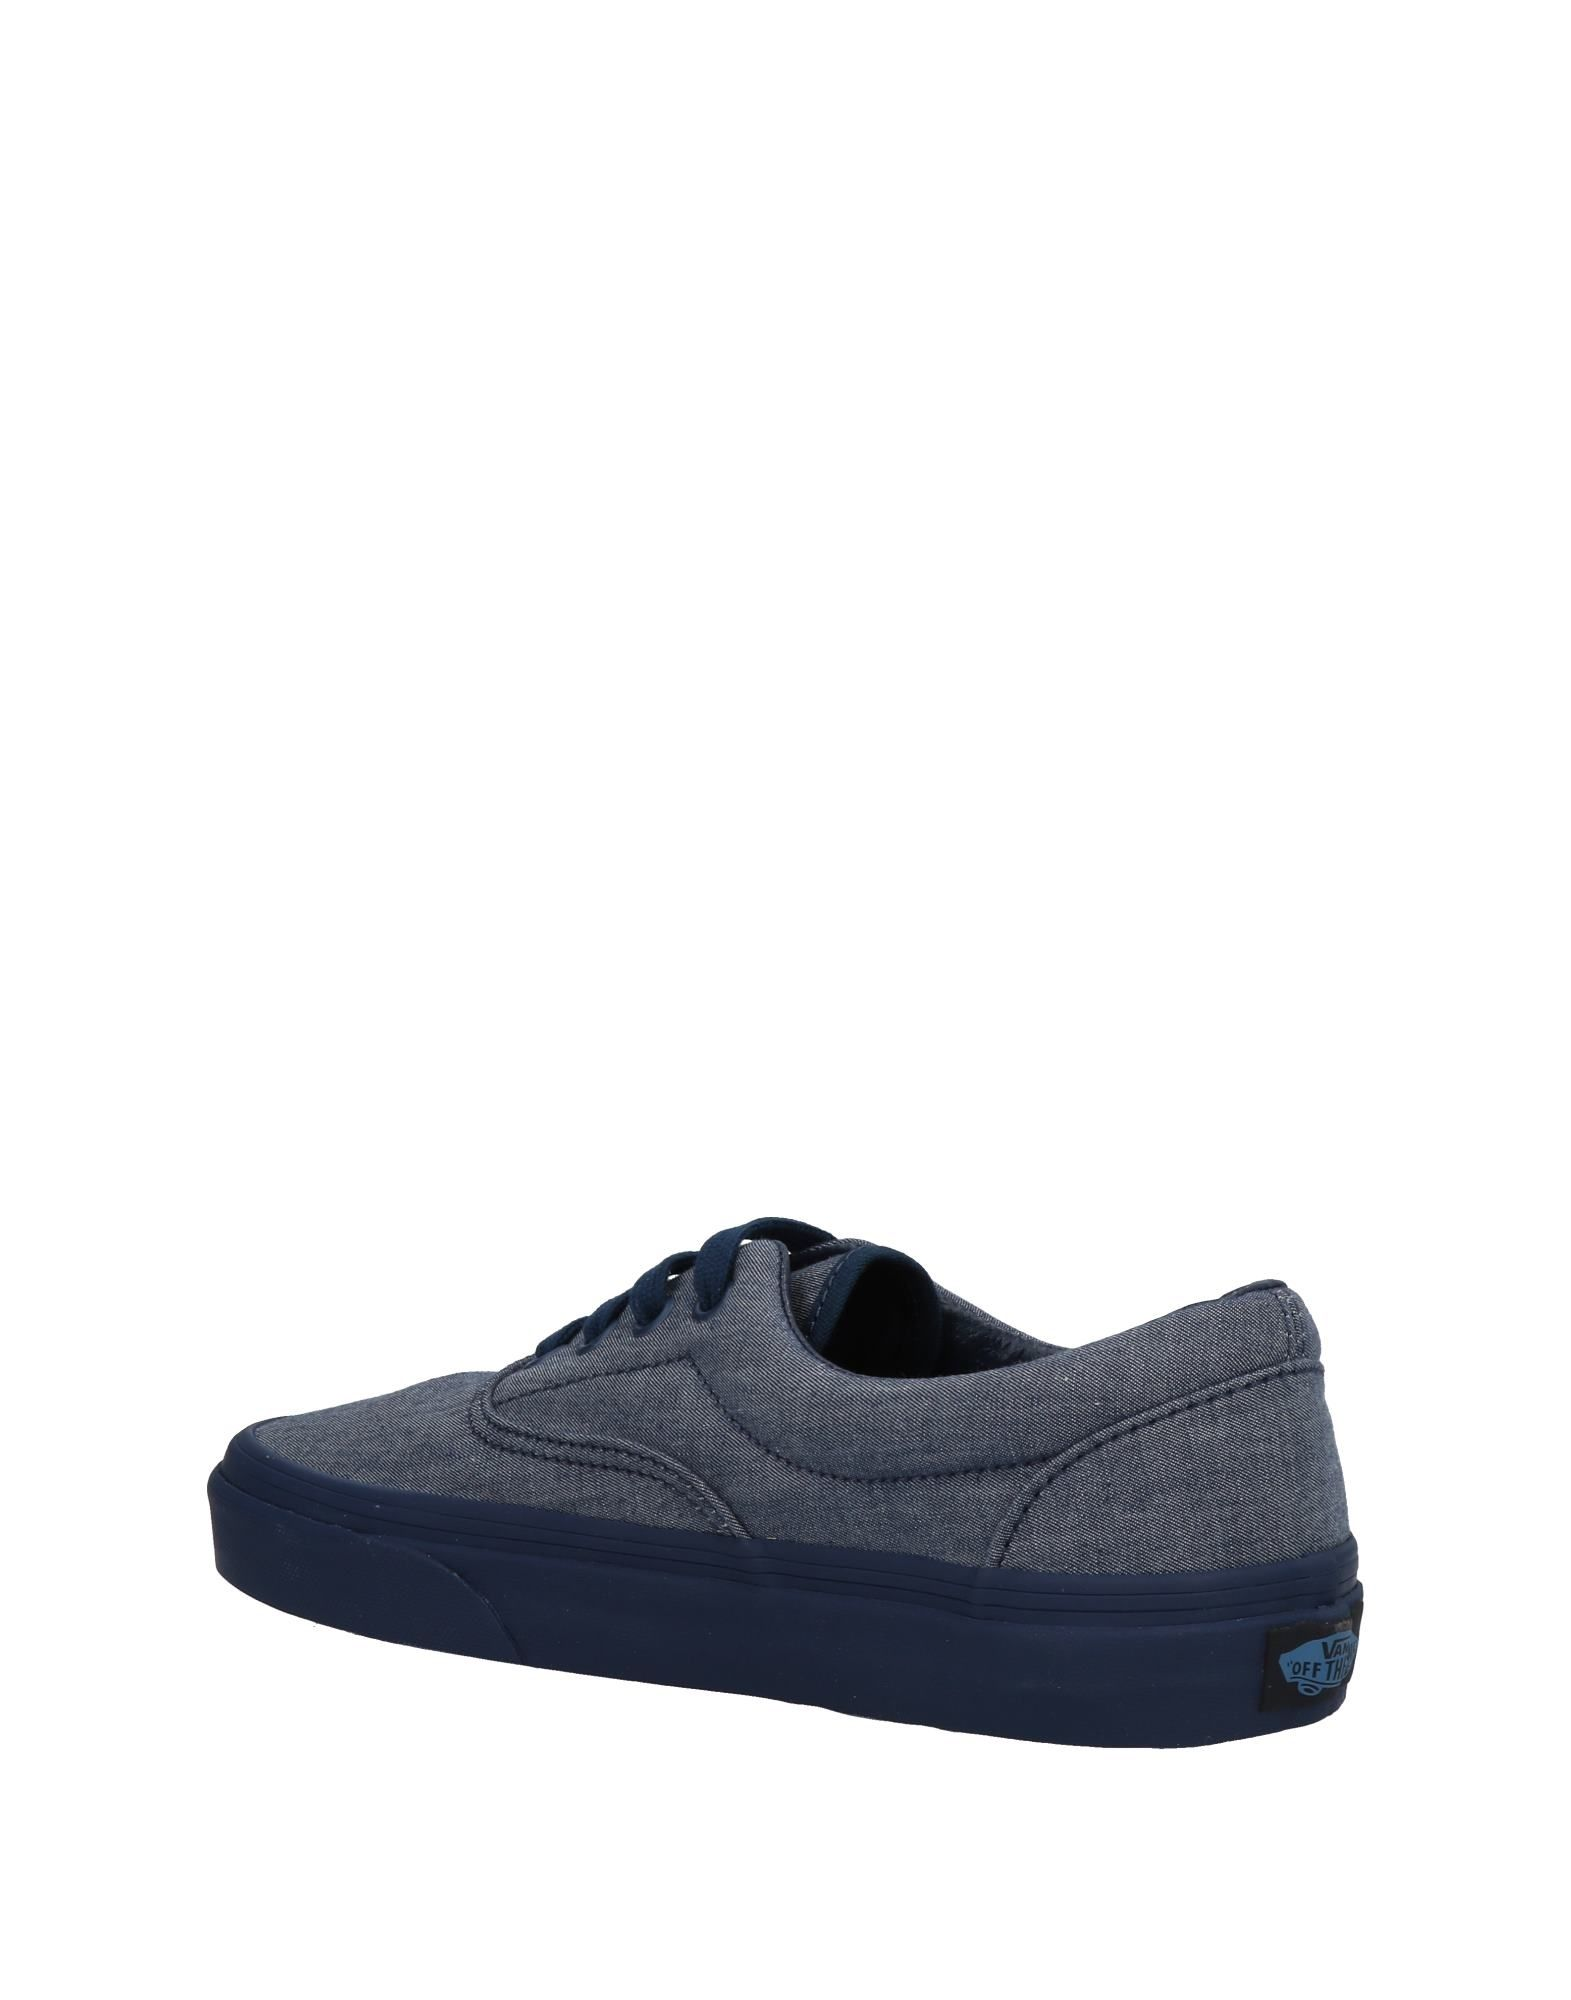 Vans Sneakers Schuhe Damen  11492578XW Heiße Schuhe Sneakers 83271e